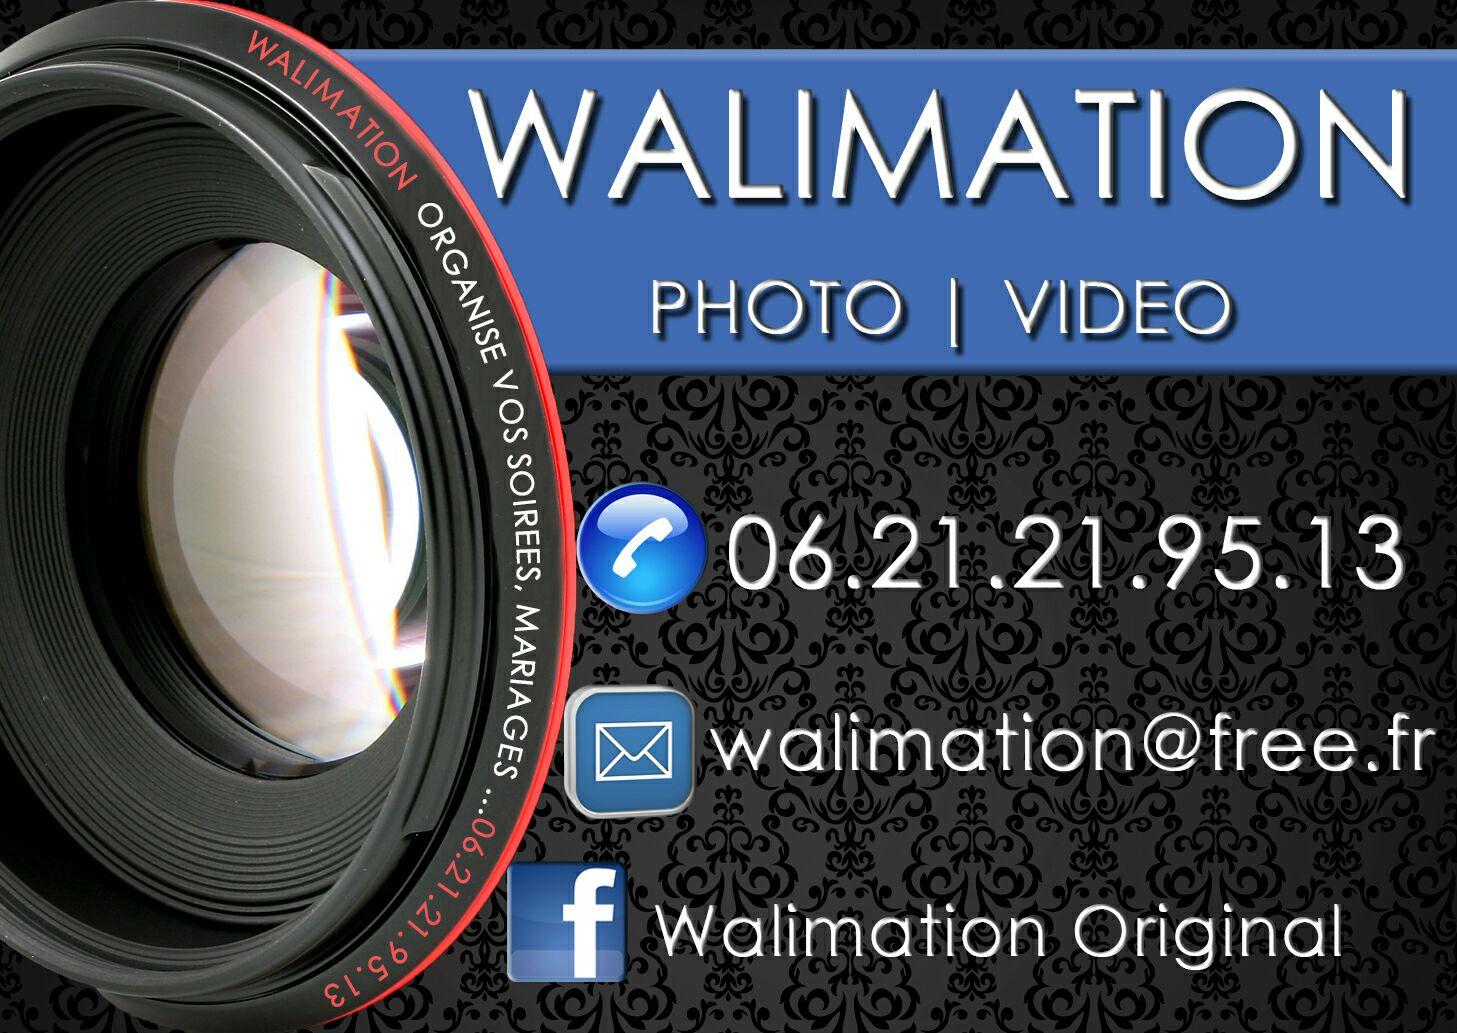 Walimation